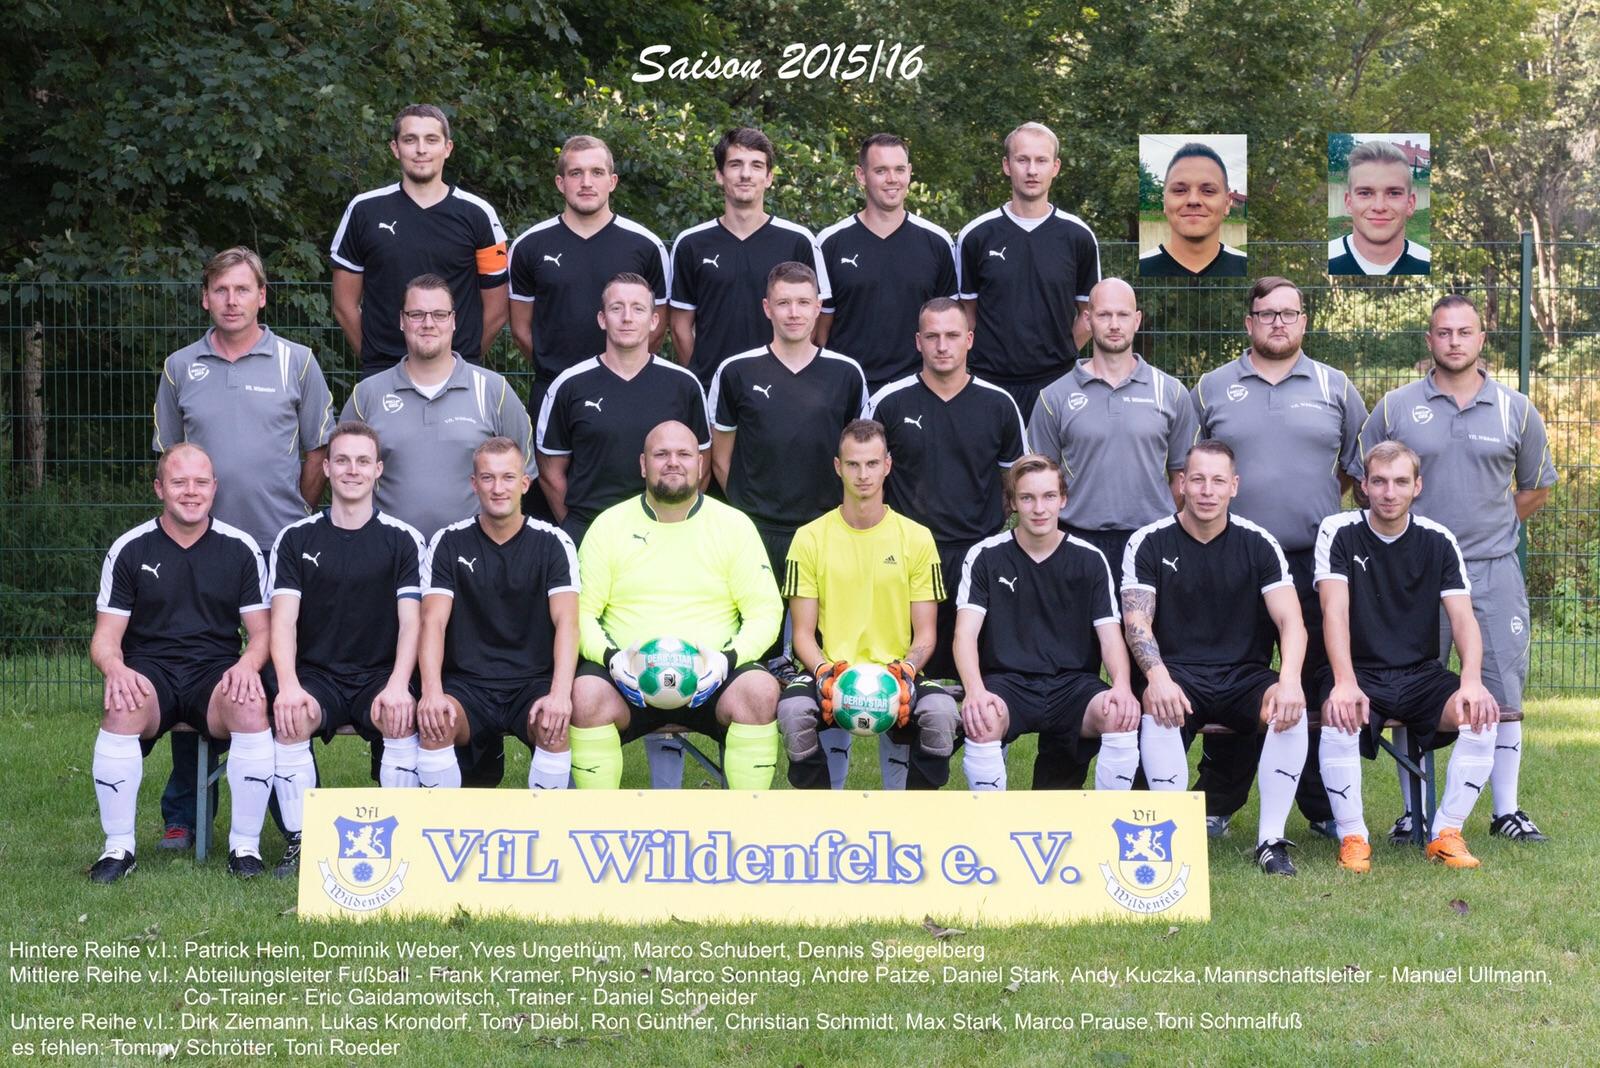 Vfl Wildenfels